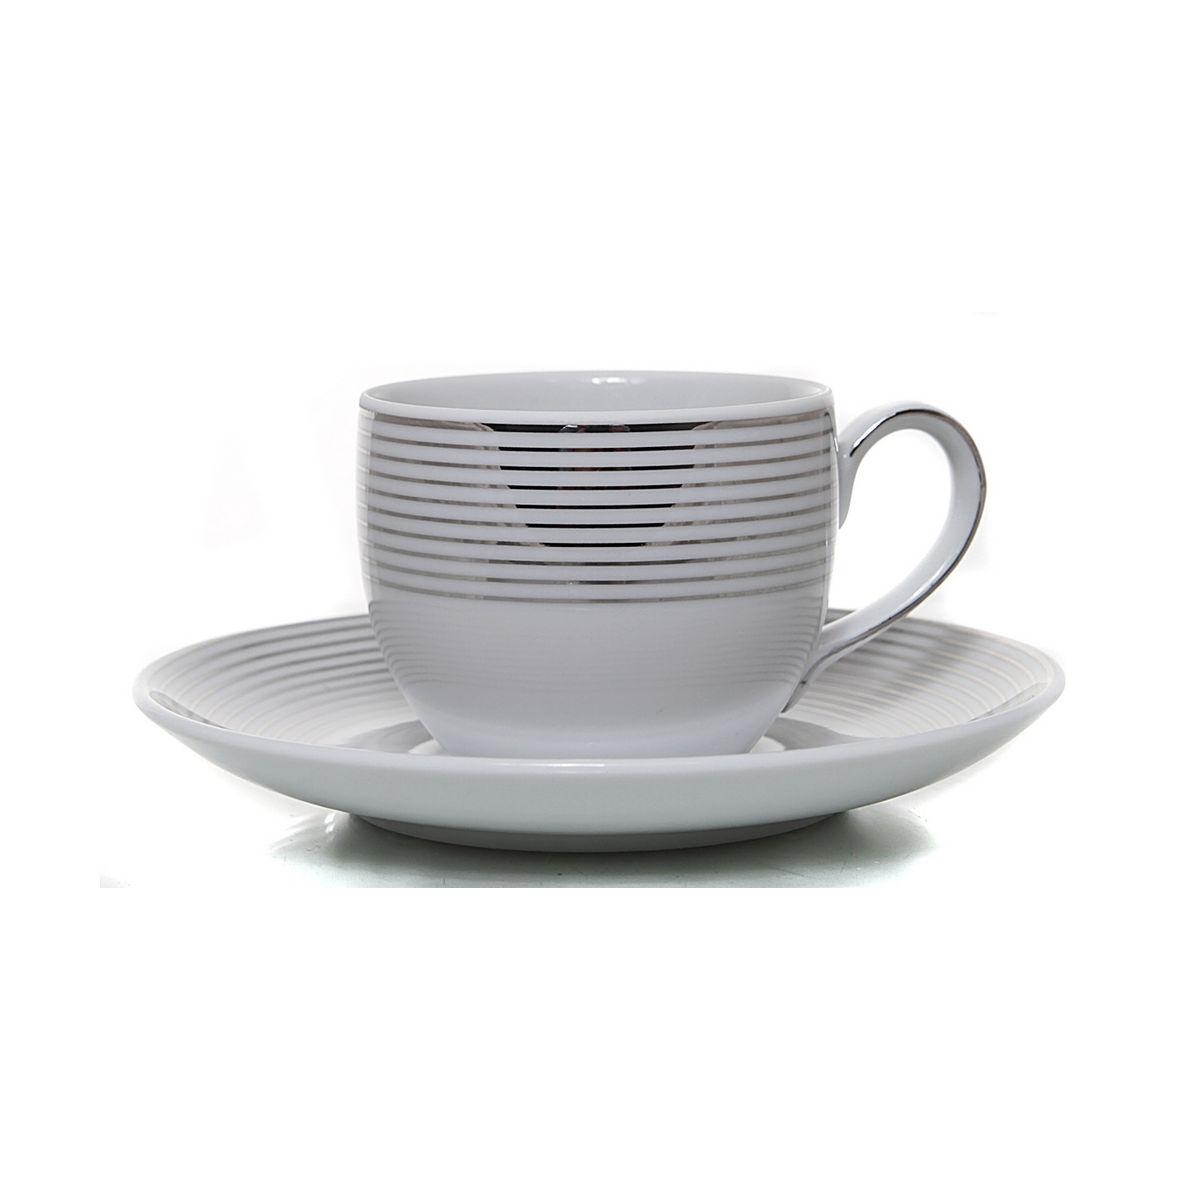 Ingrid Serviciu Cafea Portelan 6 Persoane 100 Ml 2021 aranjareamesei.ro